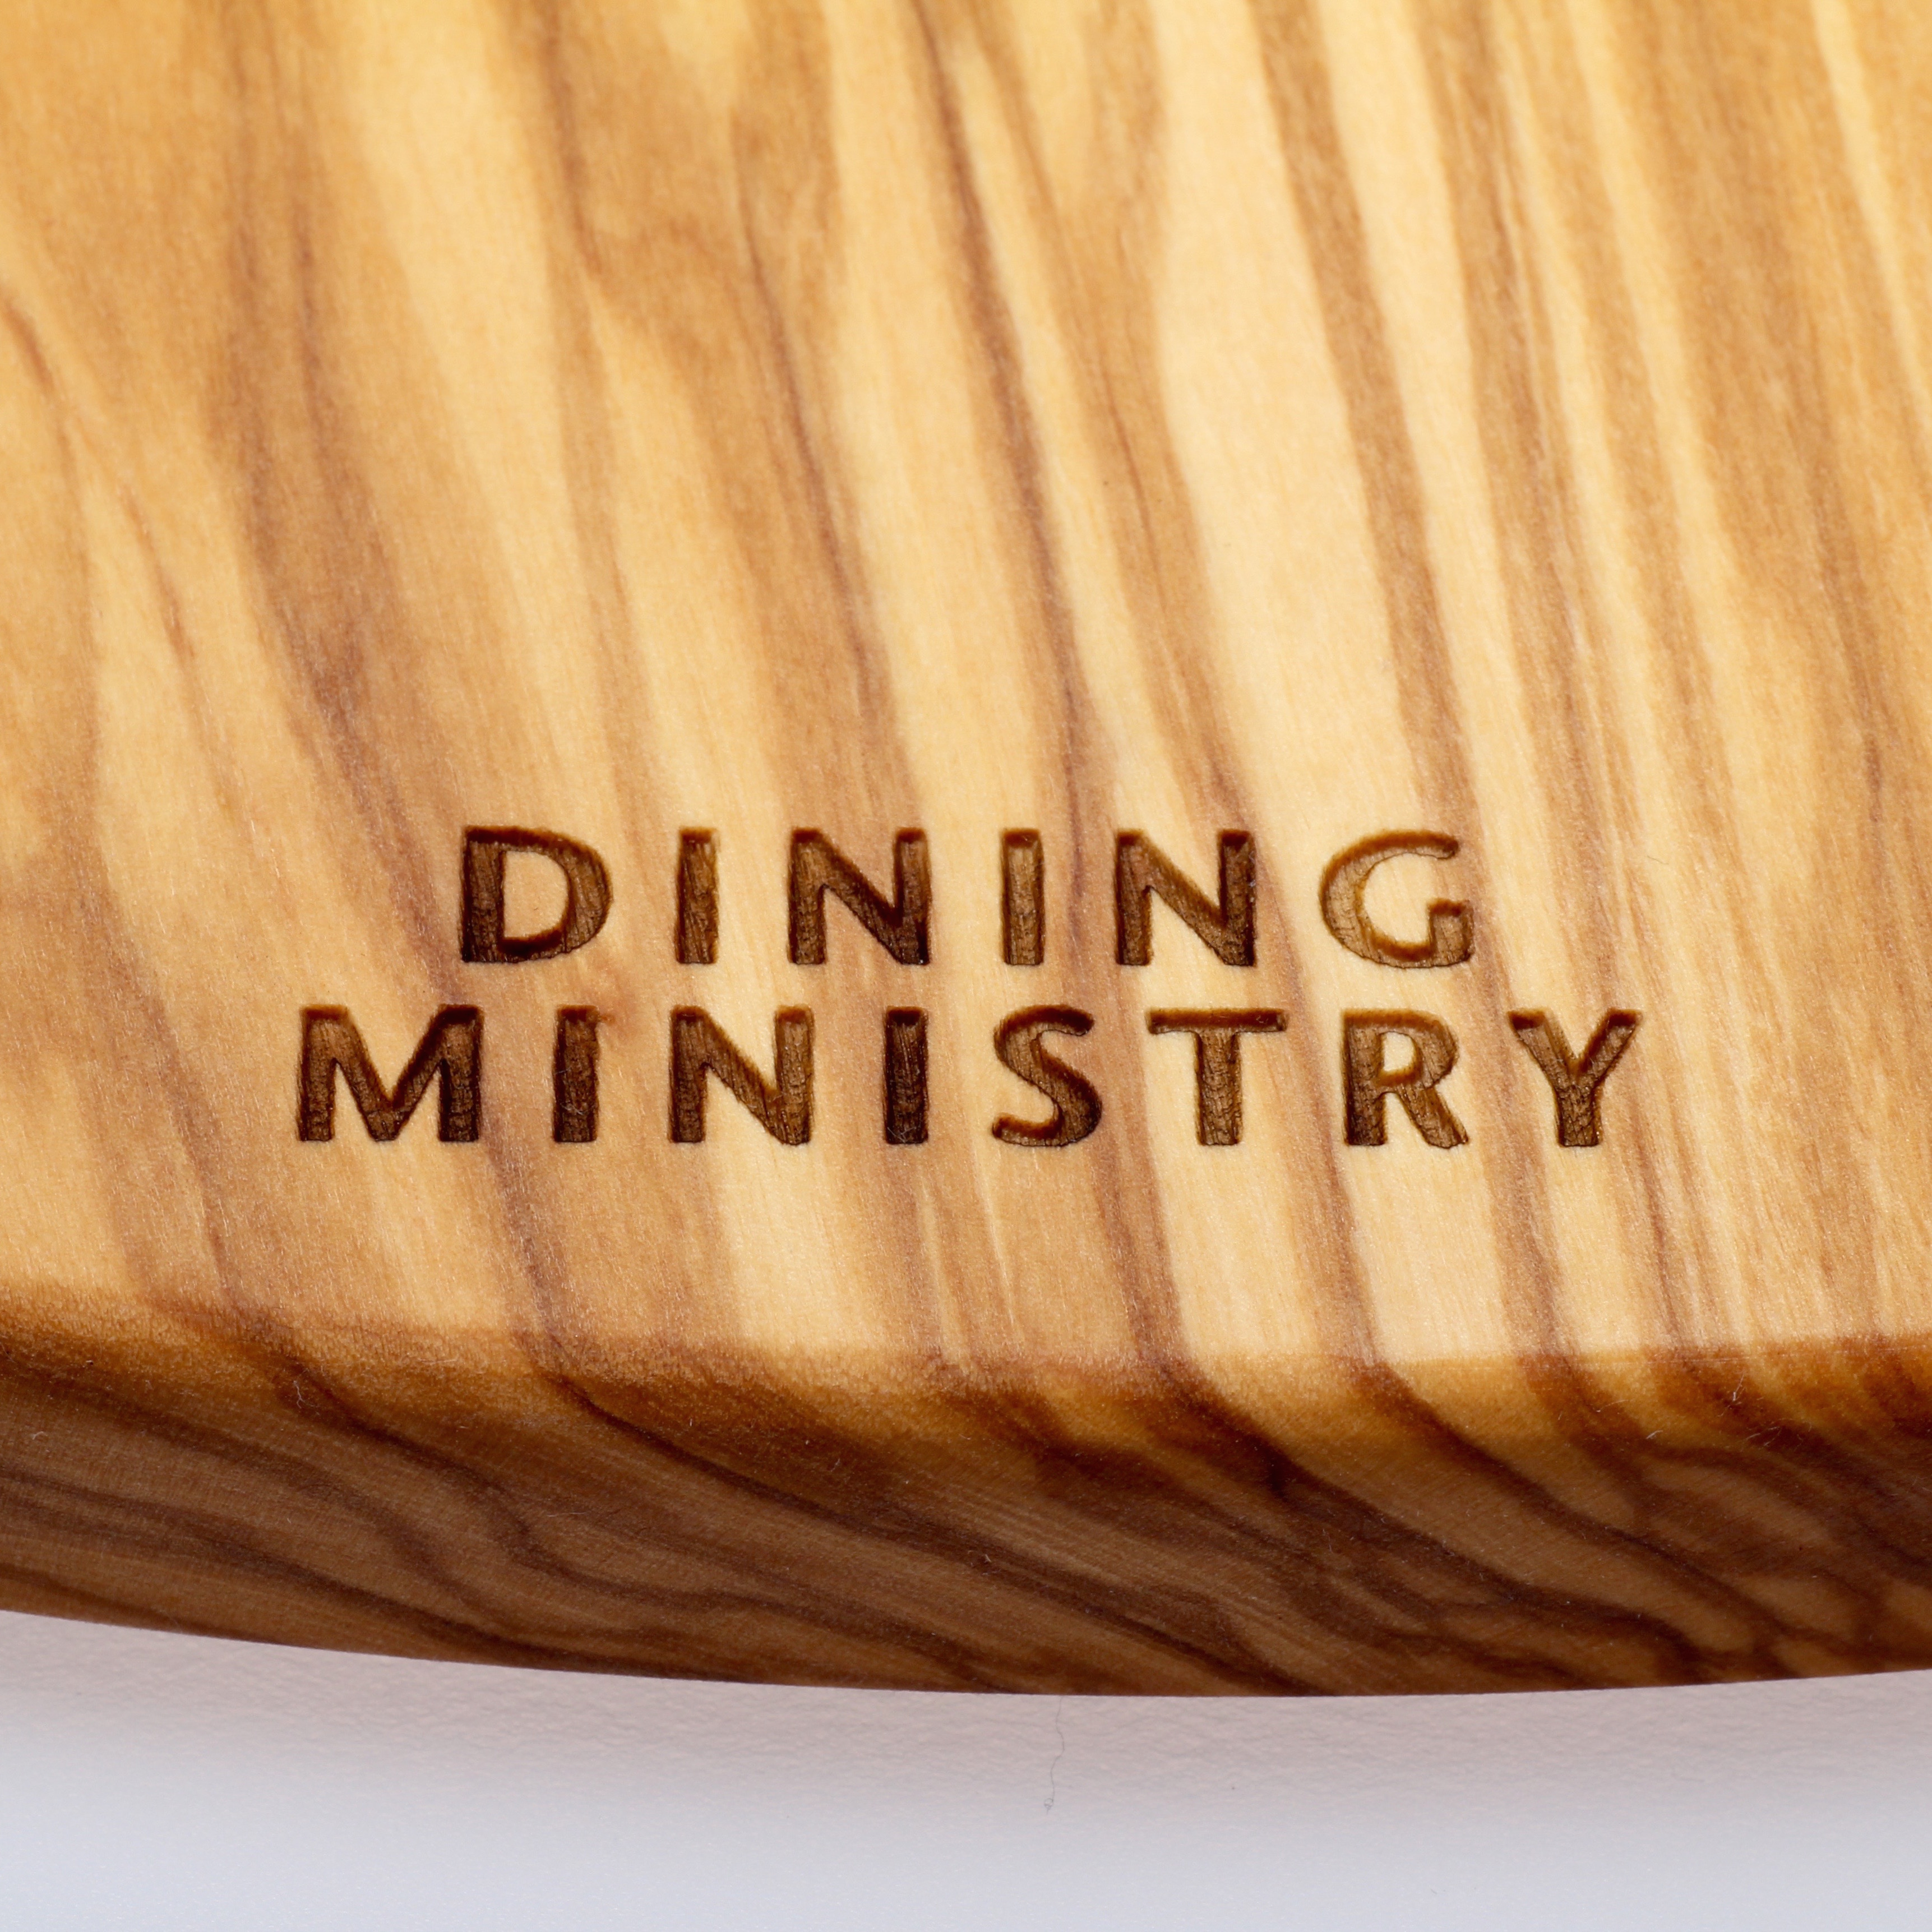 Dining Ministry Kvalitet